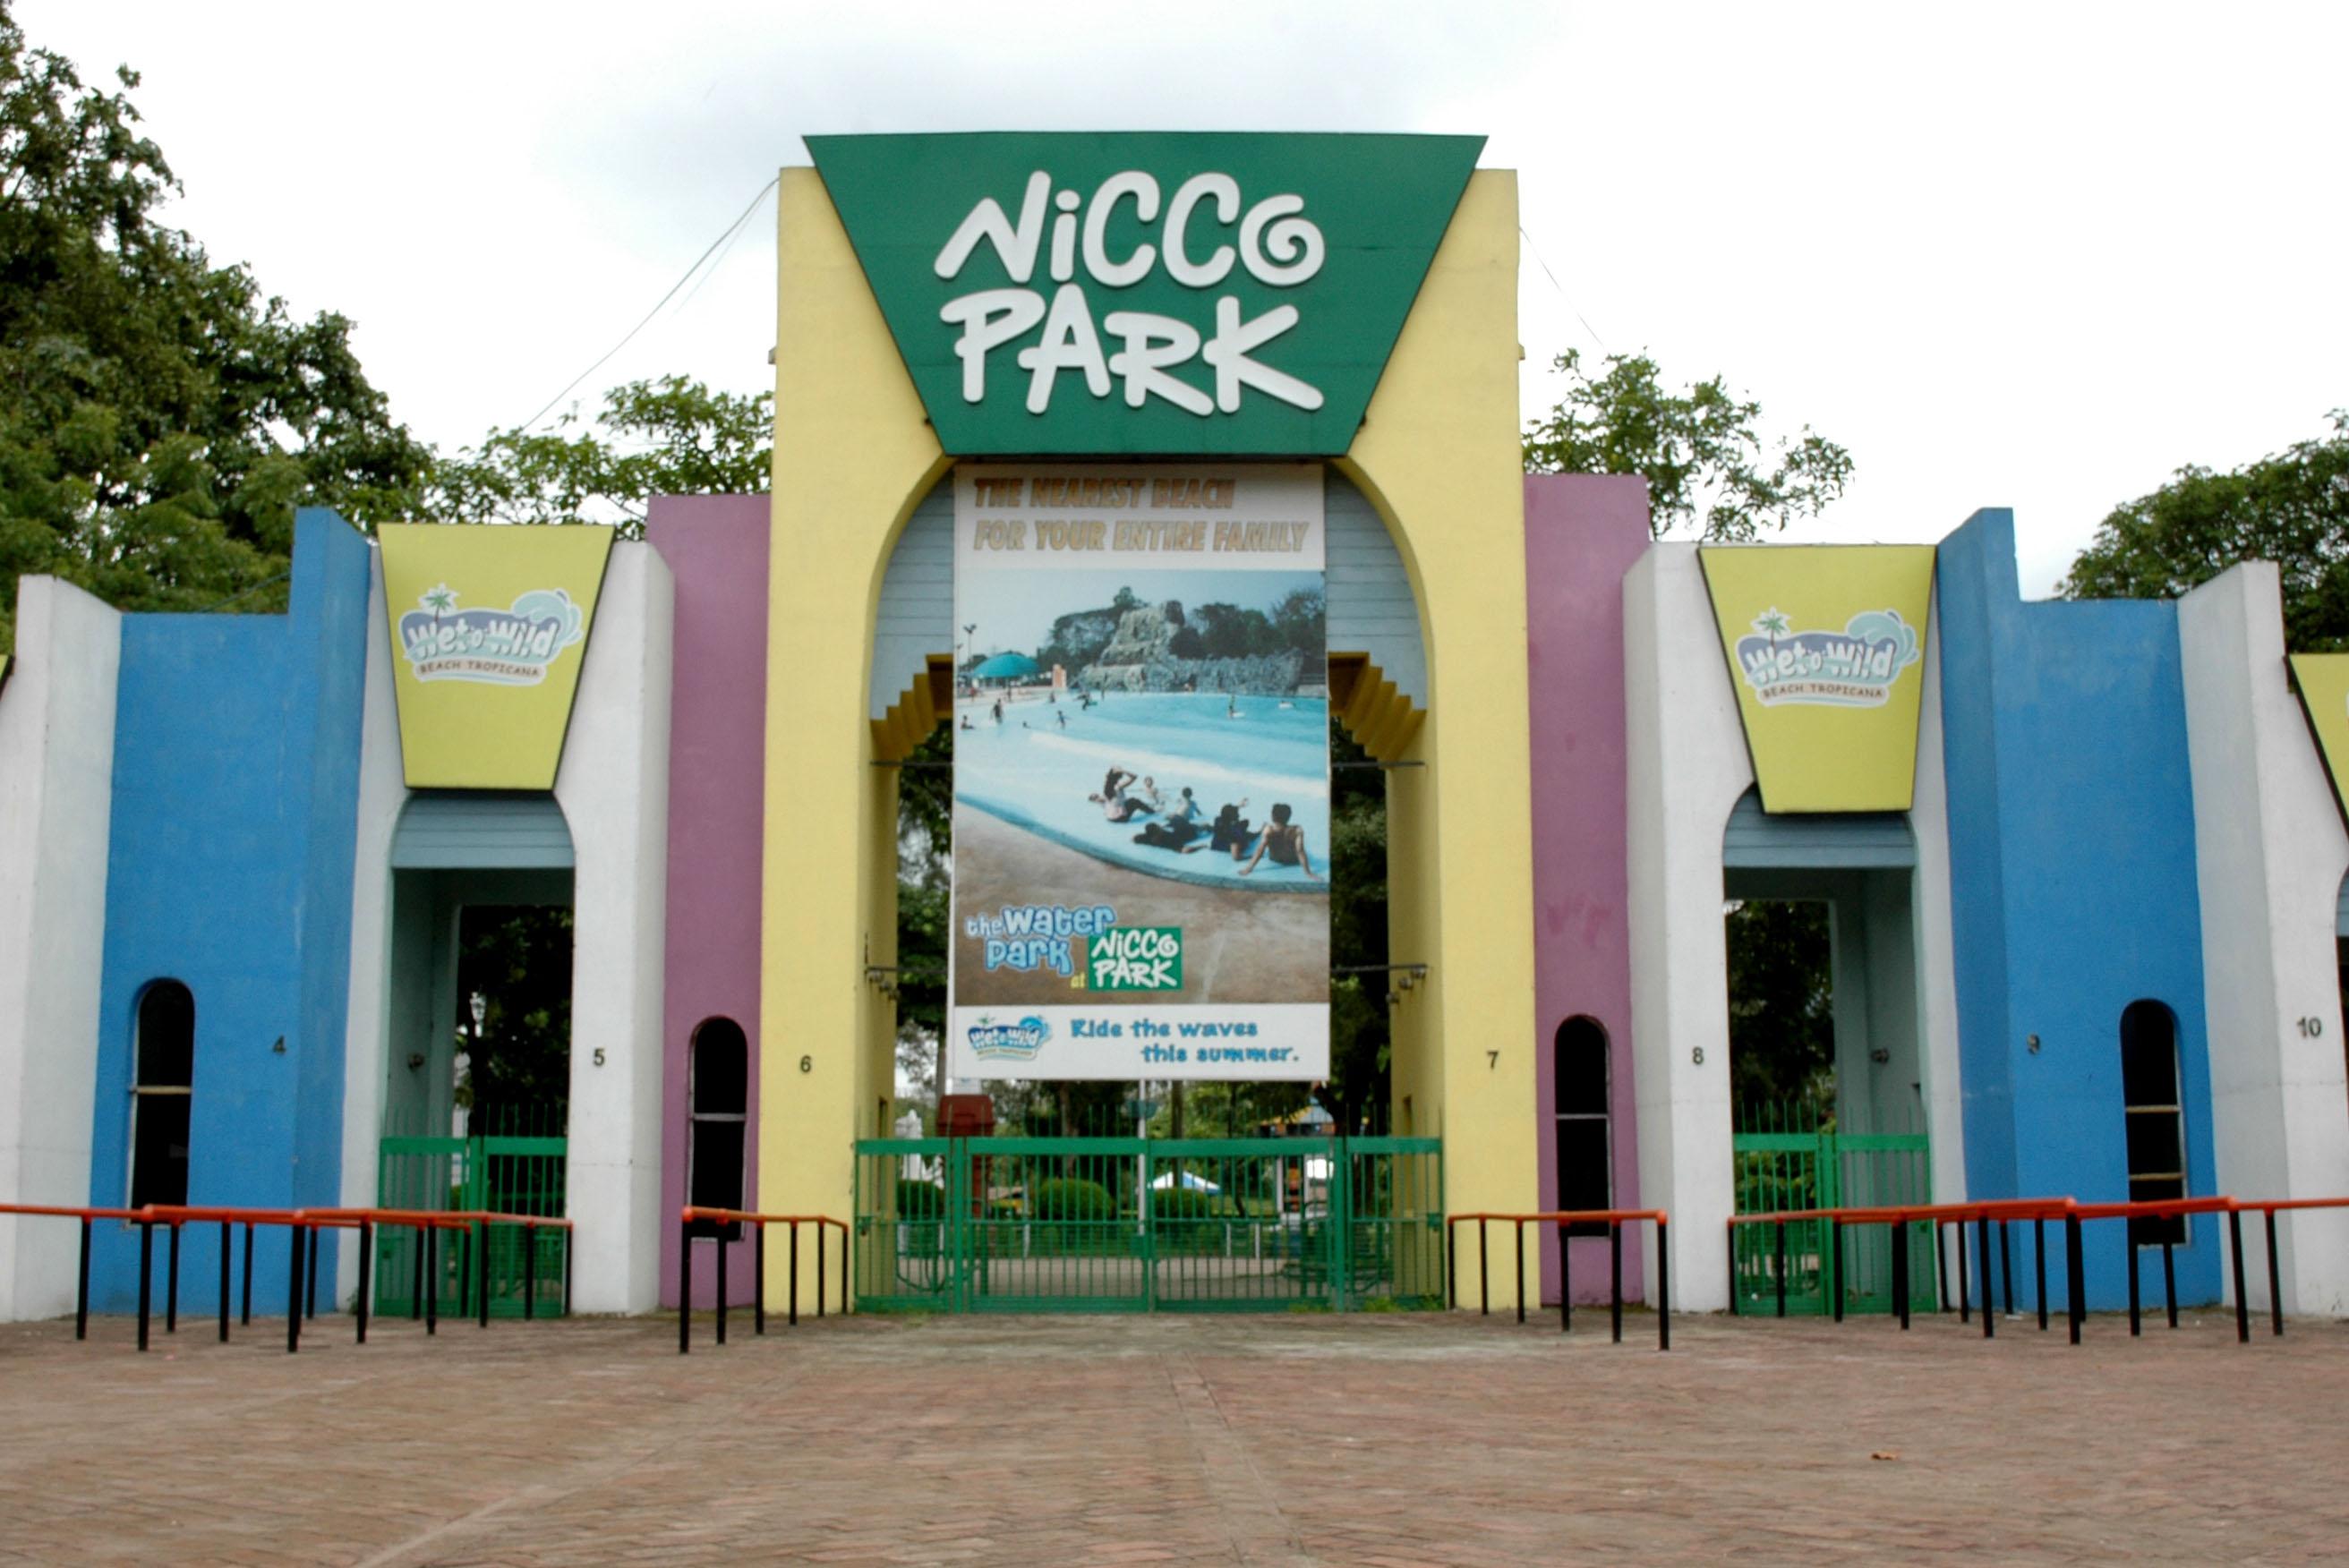 NiccoPark